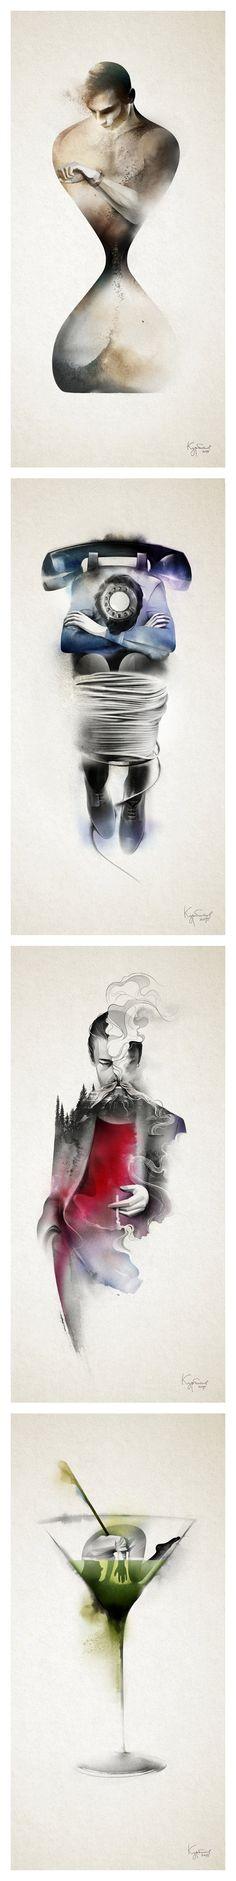 Hurt, Illustration © ЛёшаКурбатов